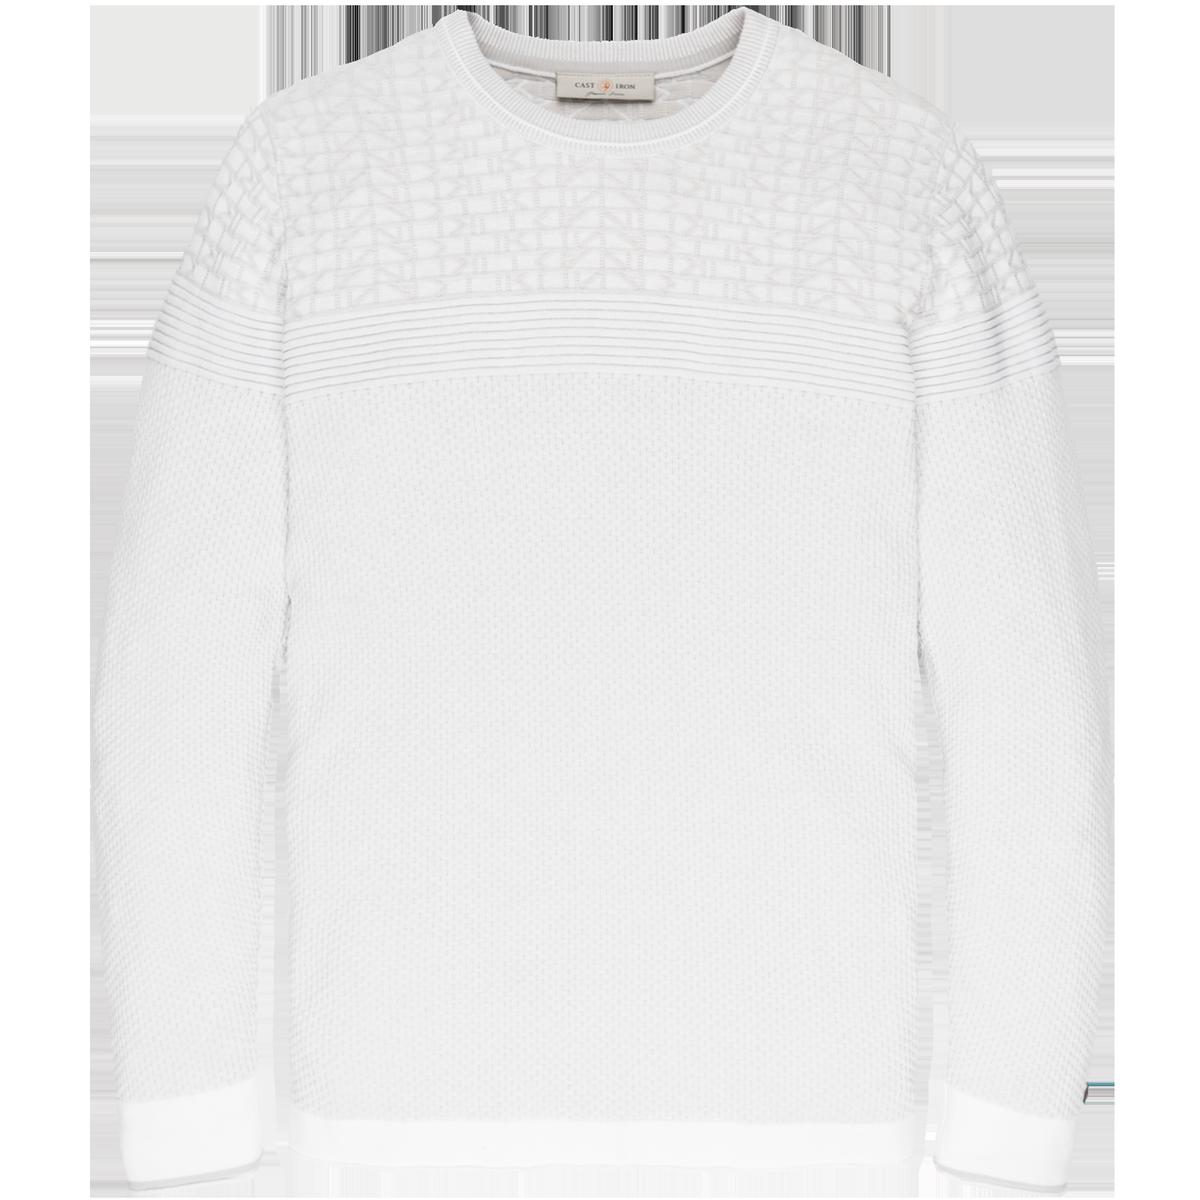 Cotton crewneck pullover CKW201301 Cast Iron clothing